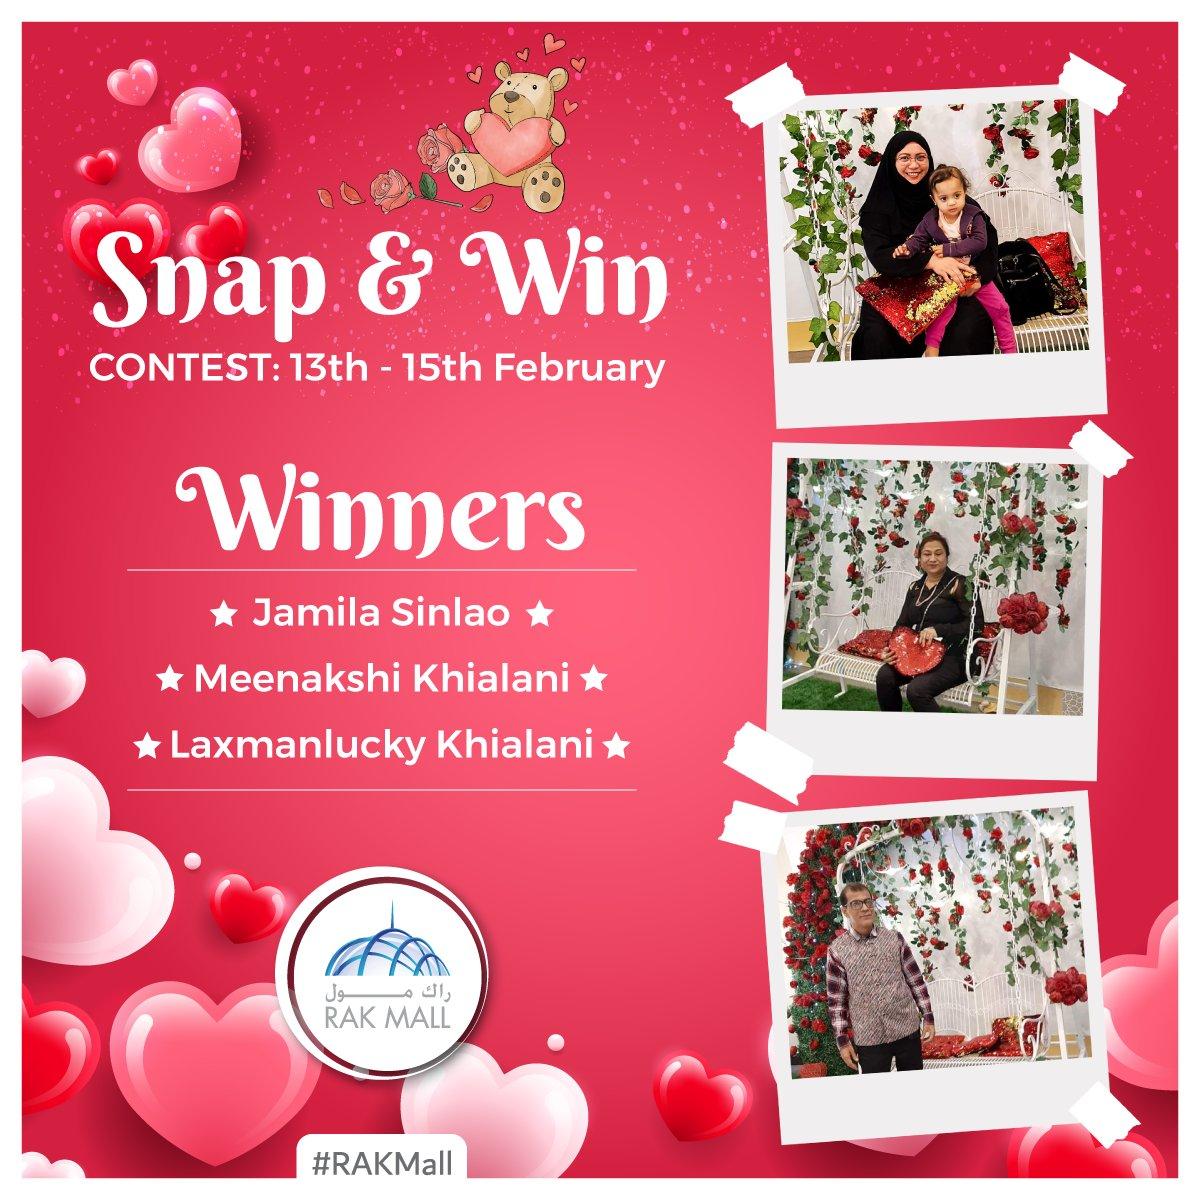 #RAKMall #MyRAK #SnapNWin   Congratulations! Here are the winners from Valentine's Day Snap & Win Contest held at RAK Mall  #ValentinesDayContest